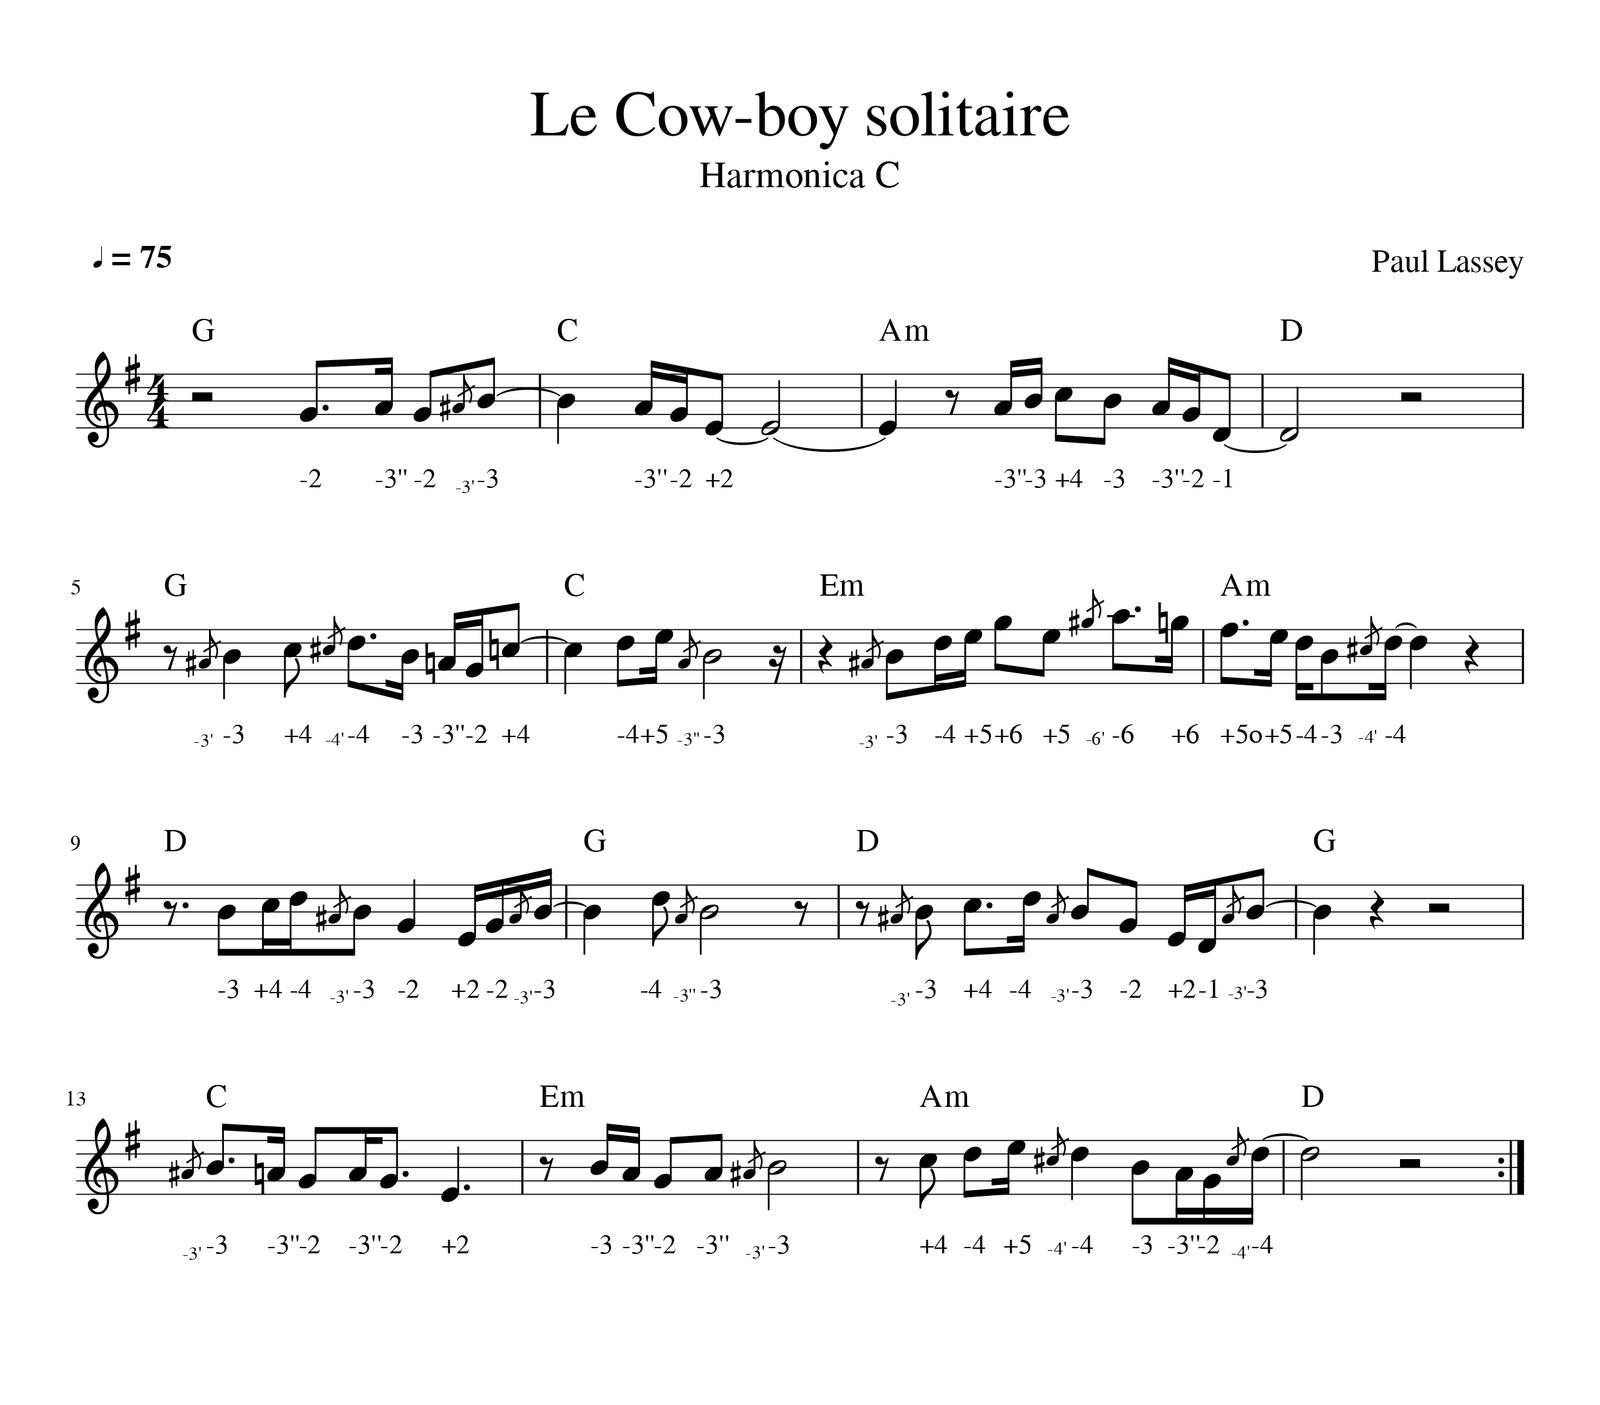 Exercice : Le cowboy solitaire - Harmonica C